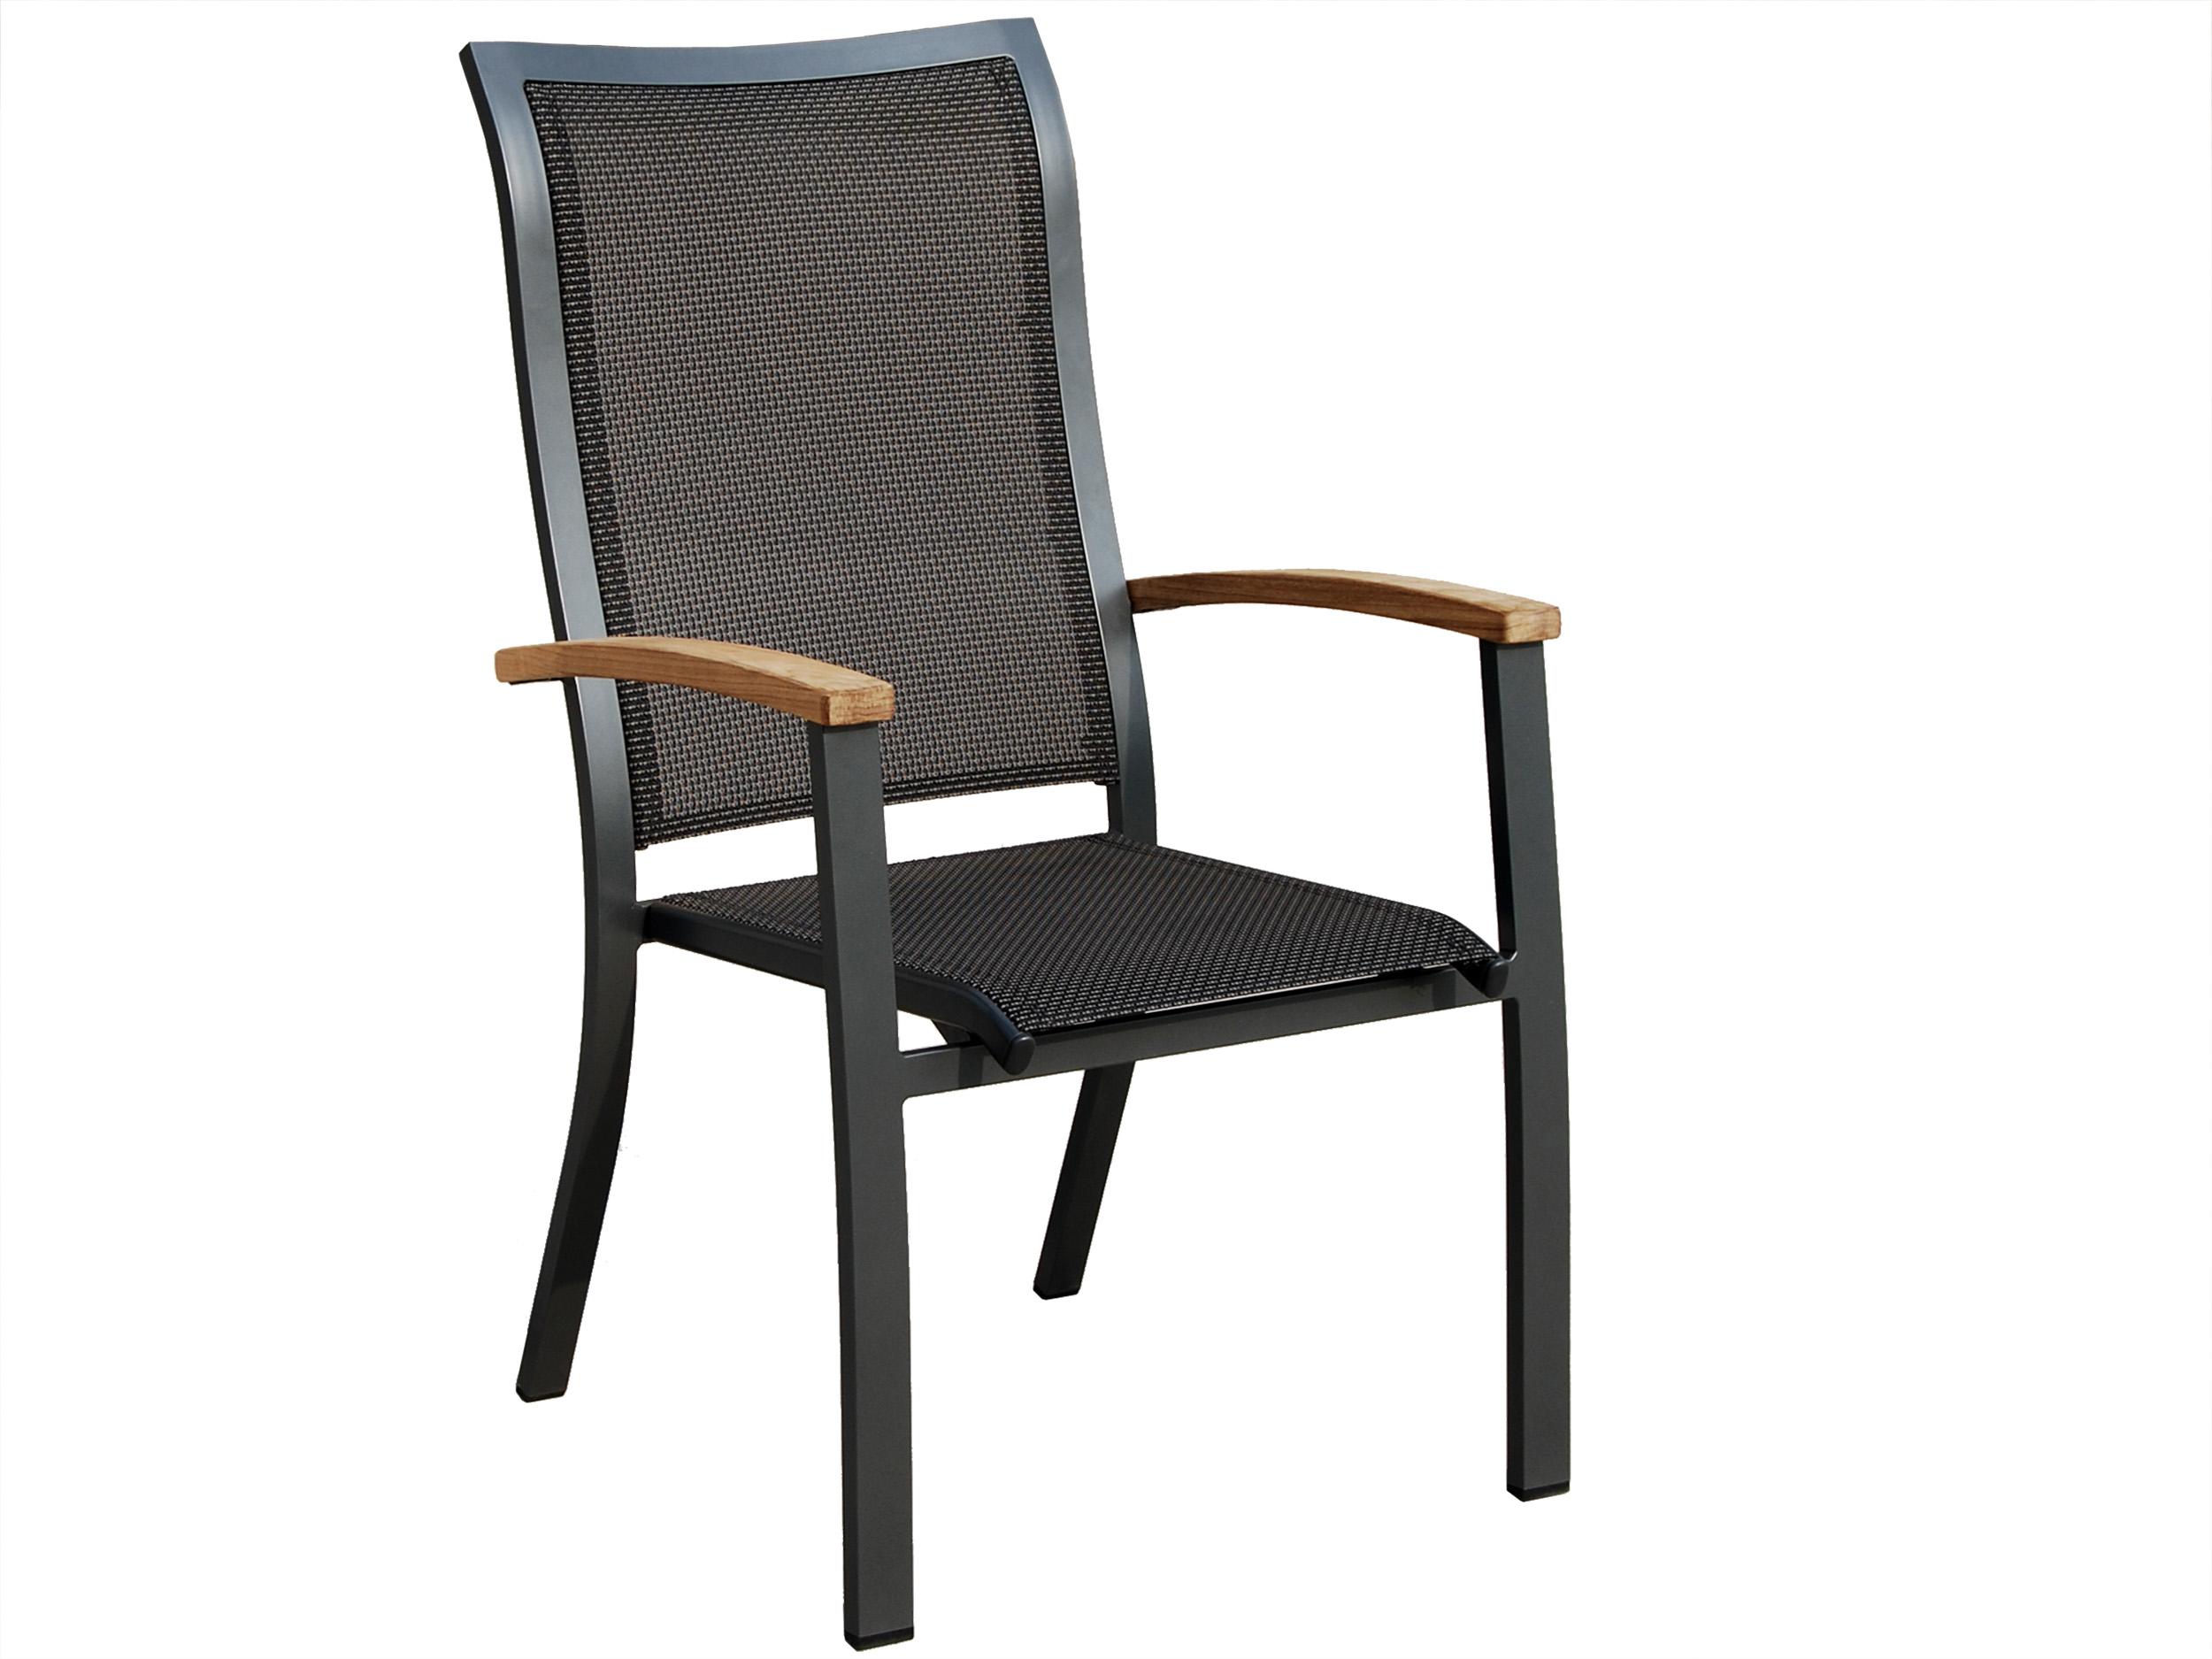 stapelsessel lugo aluminium outdoorgewebe teak gartenm bel l nse. Black Bedroom Furniture Sets. Home Design Ideas